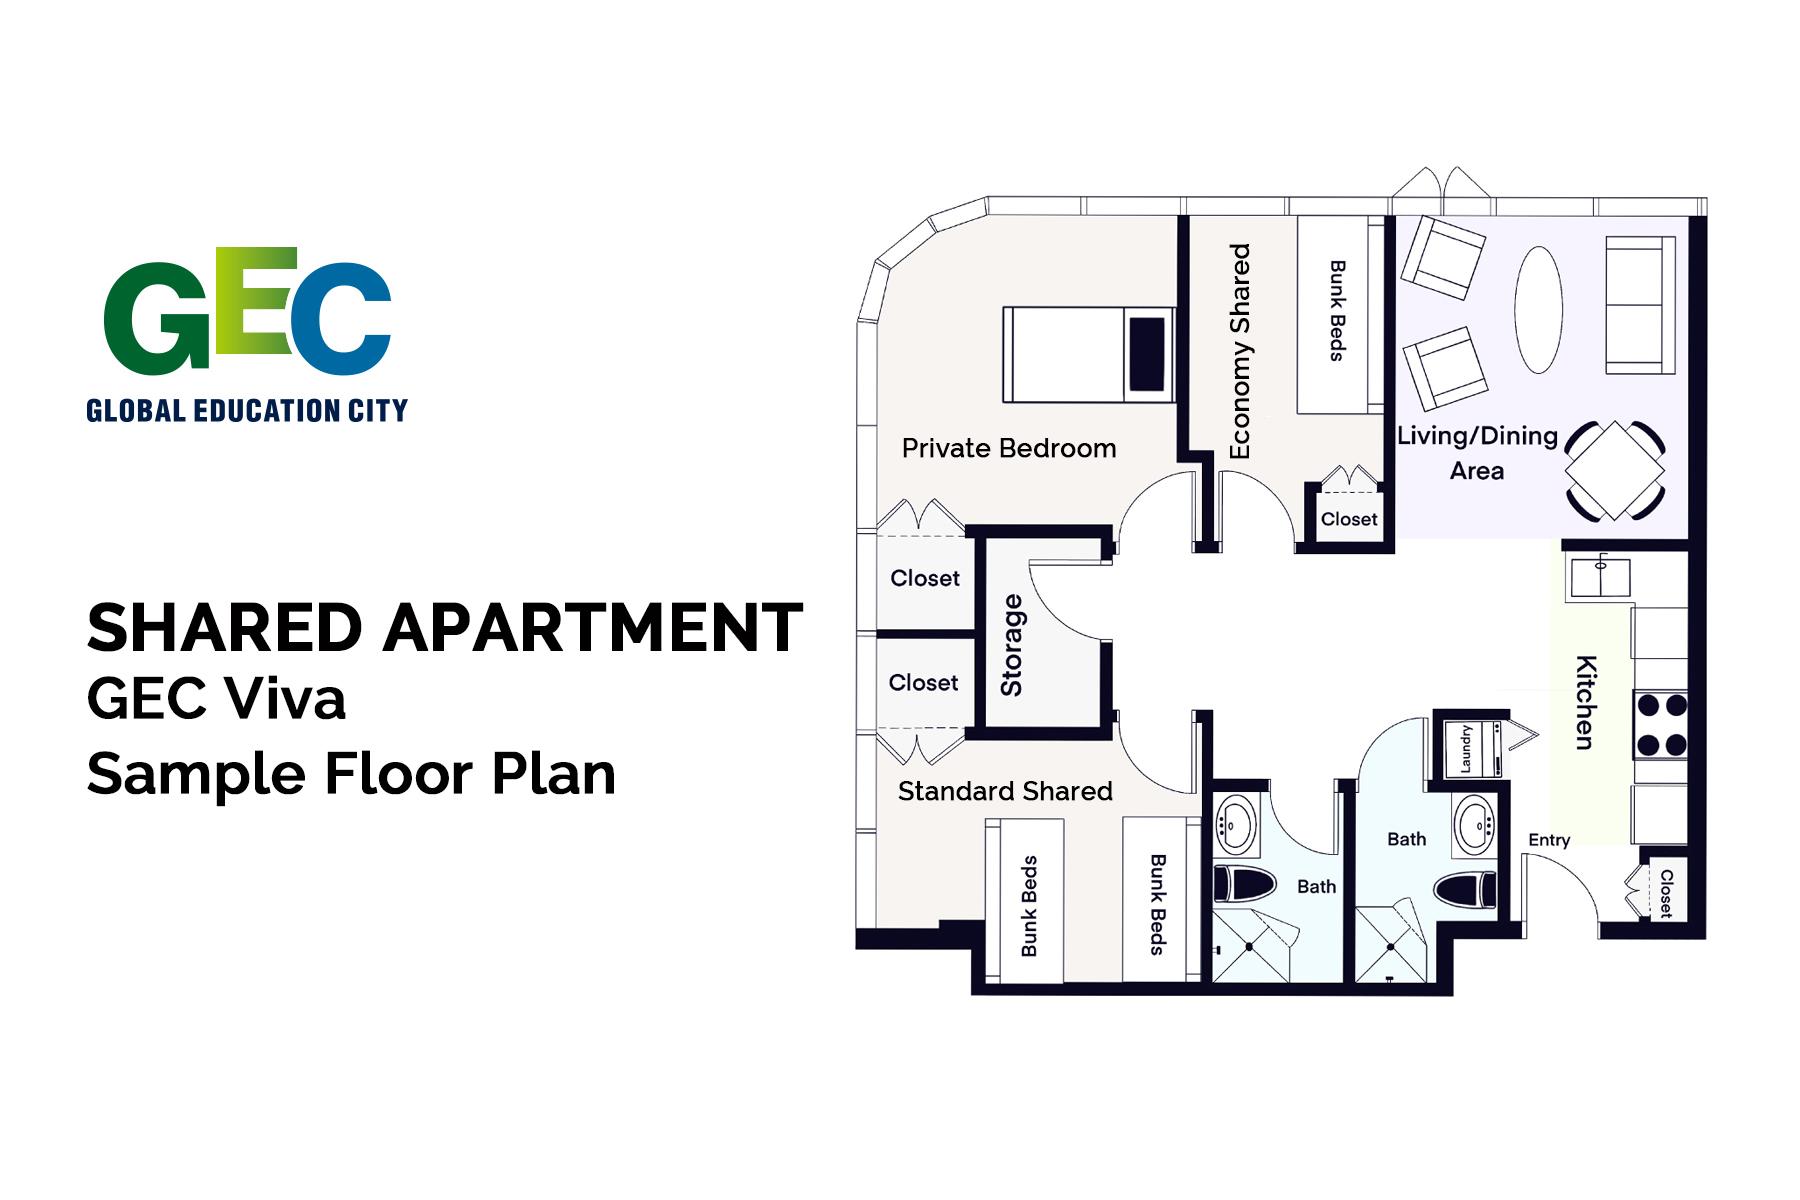 Private Bedroom floor plan